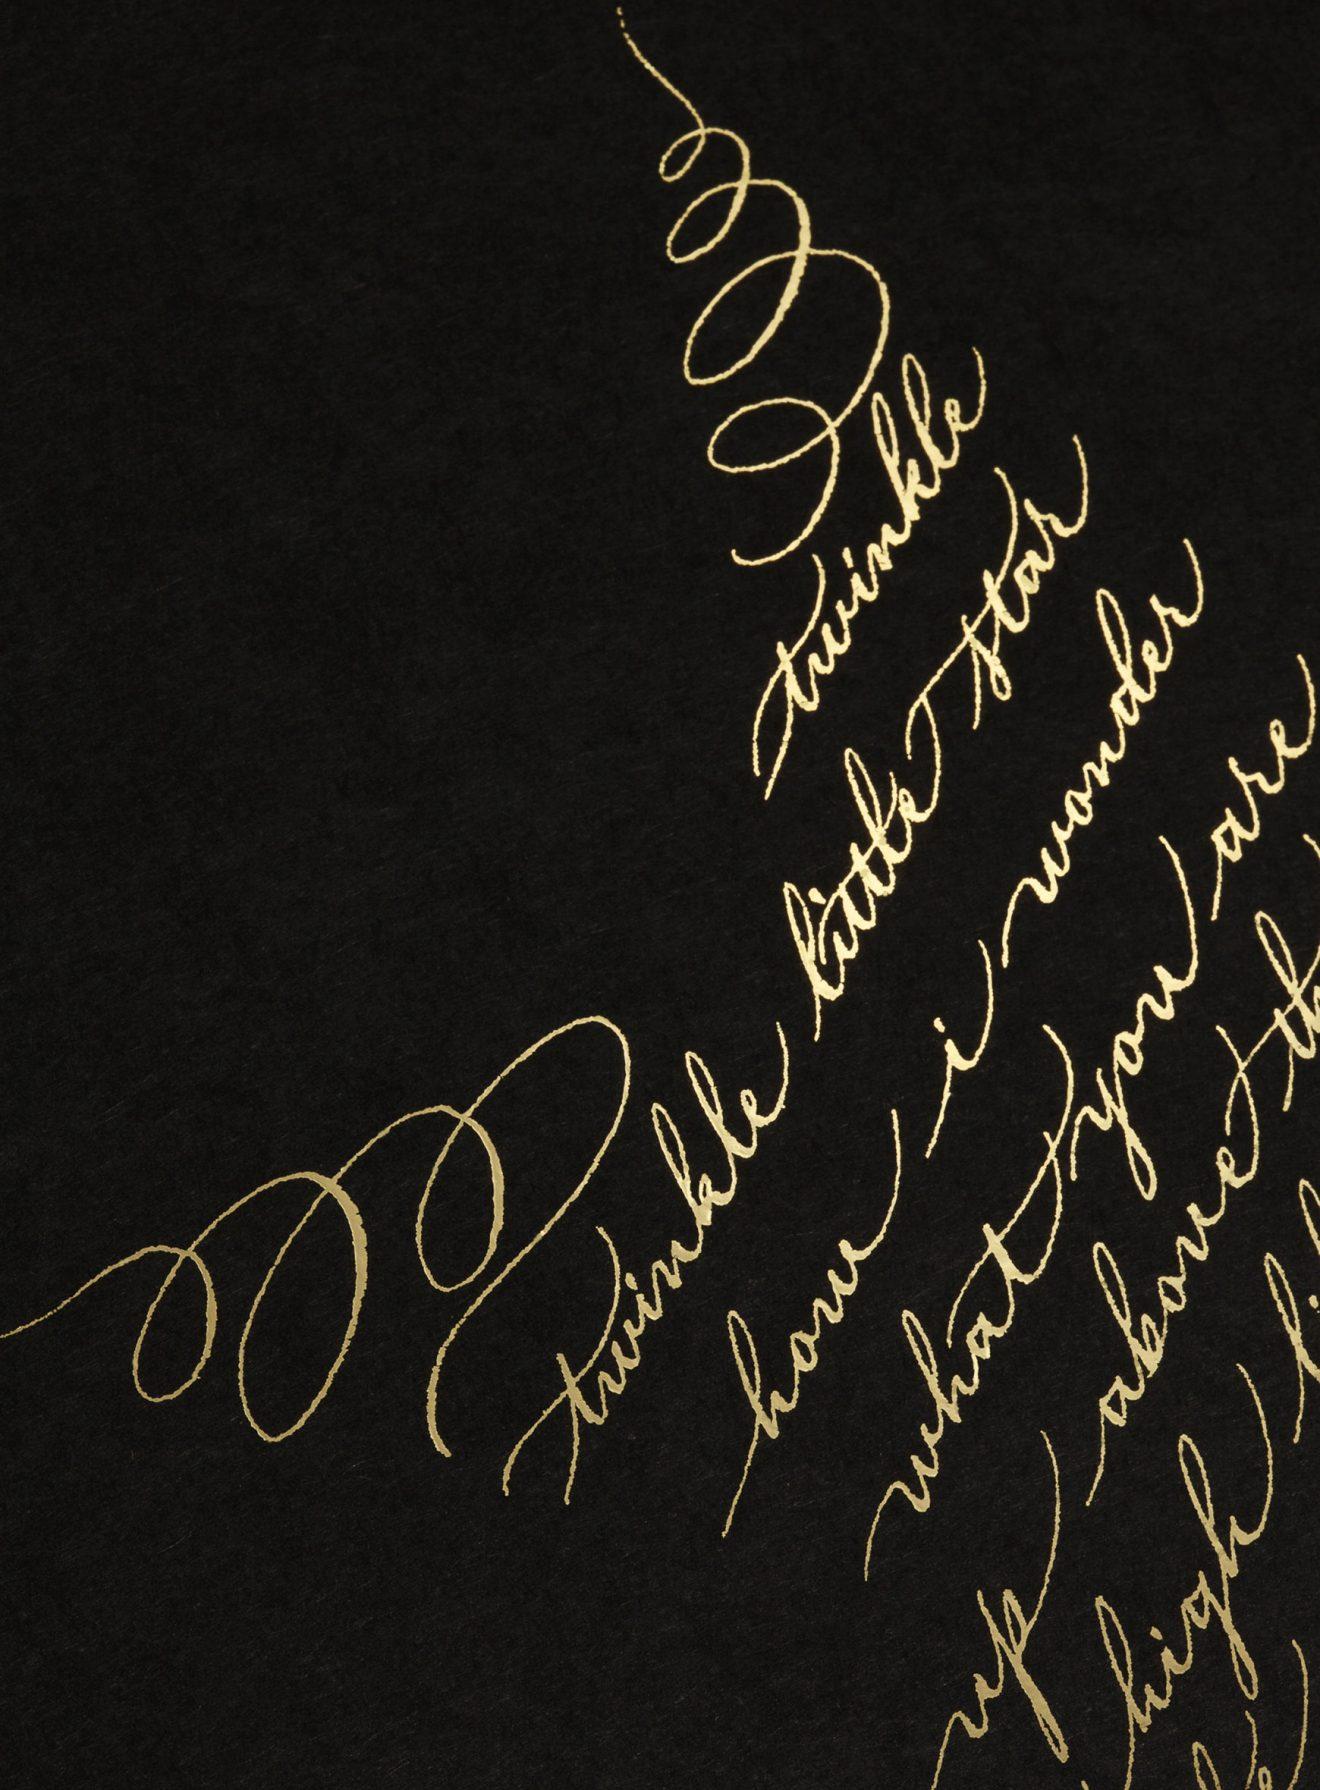 twinkle twinkle little star calligraphy print